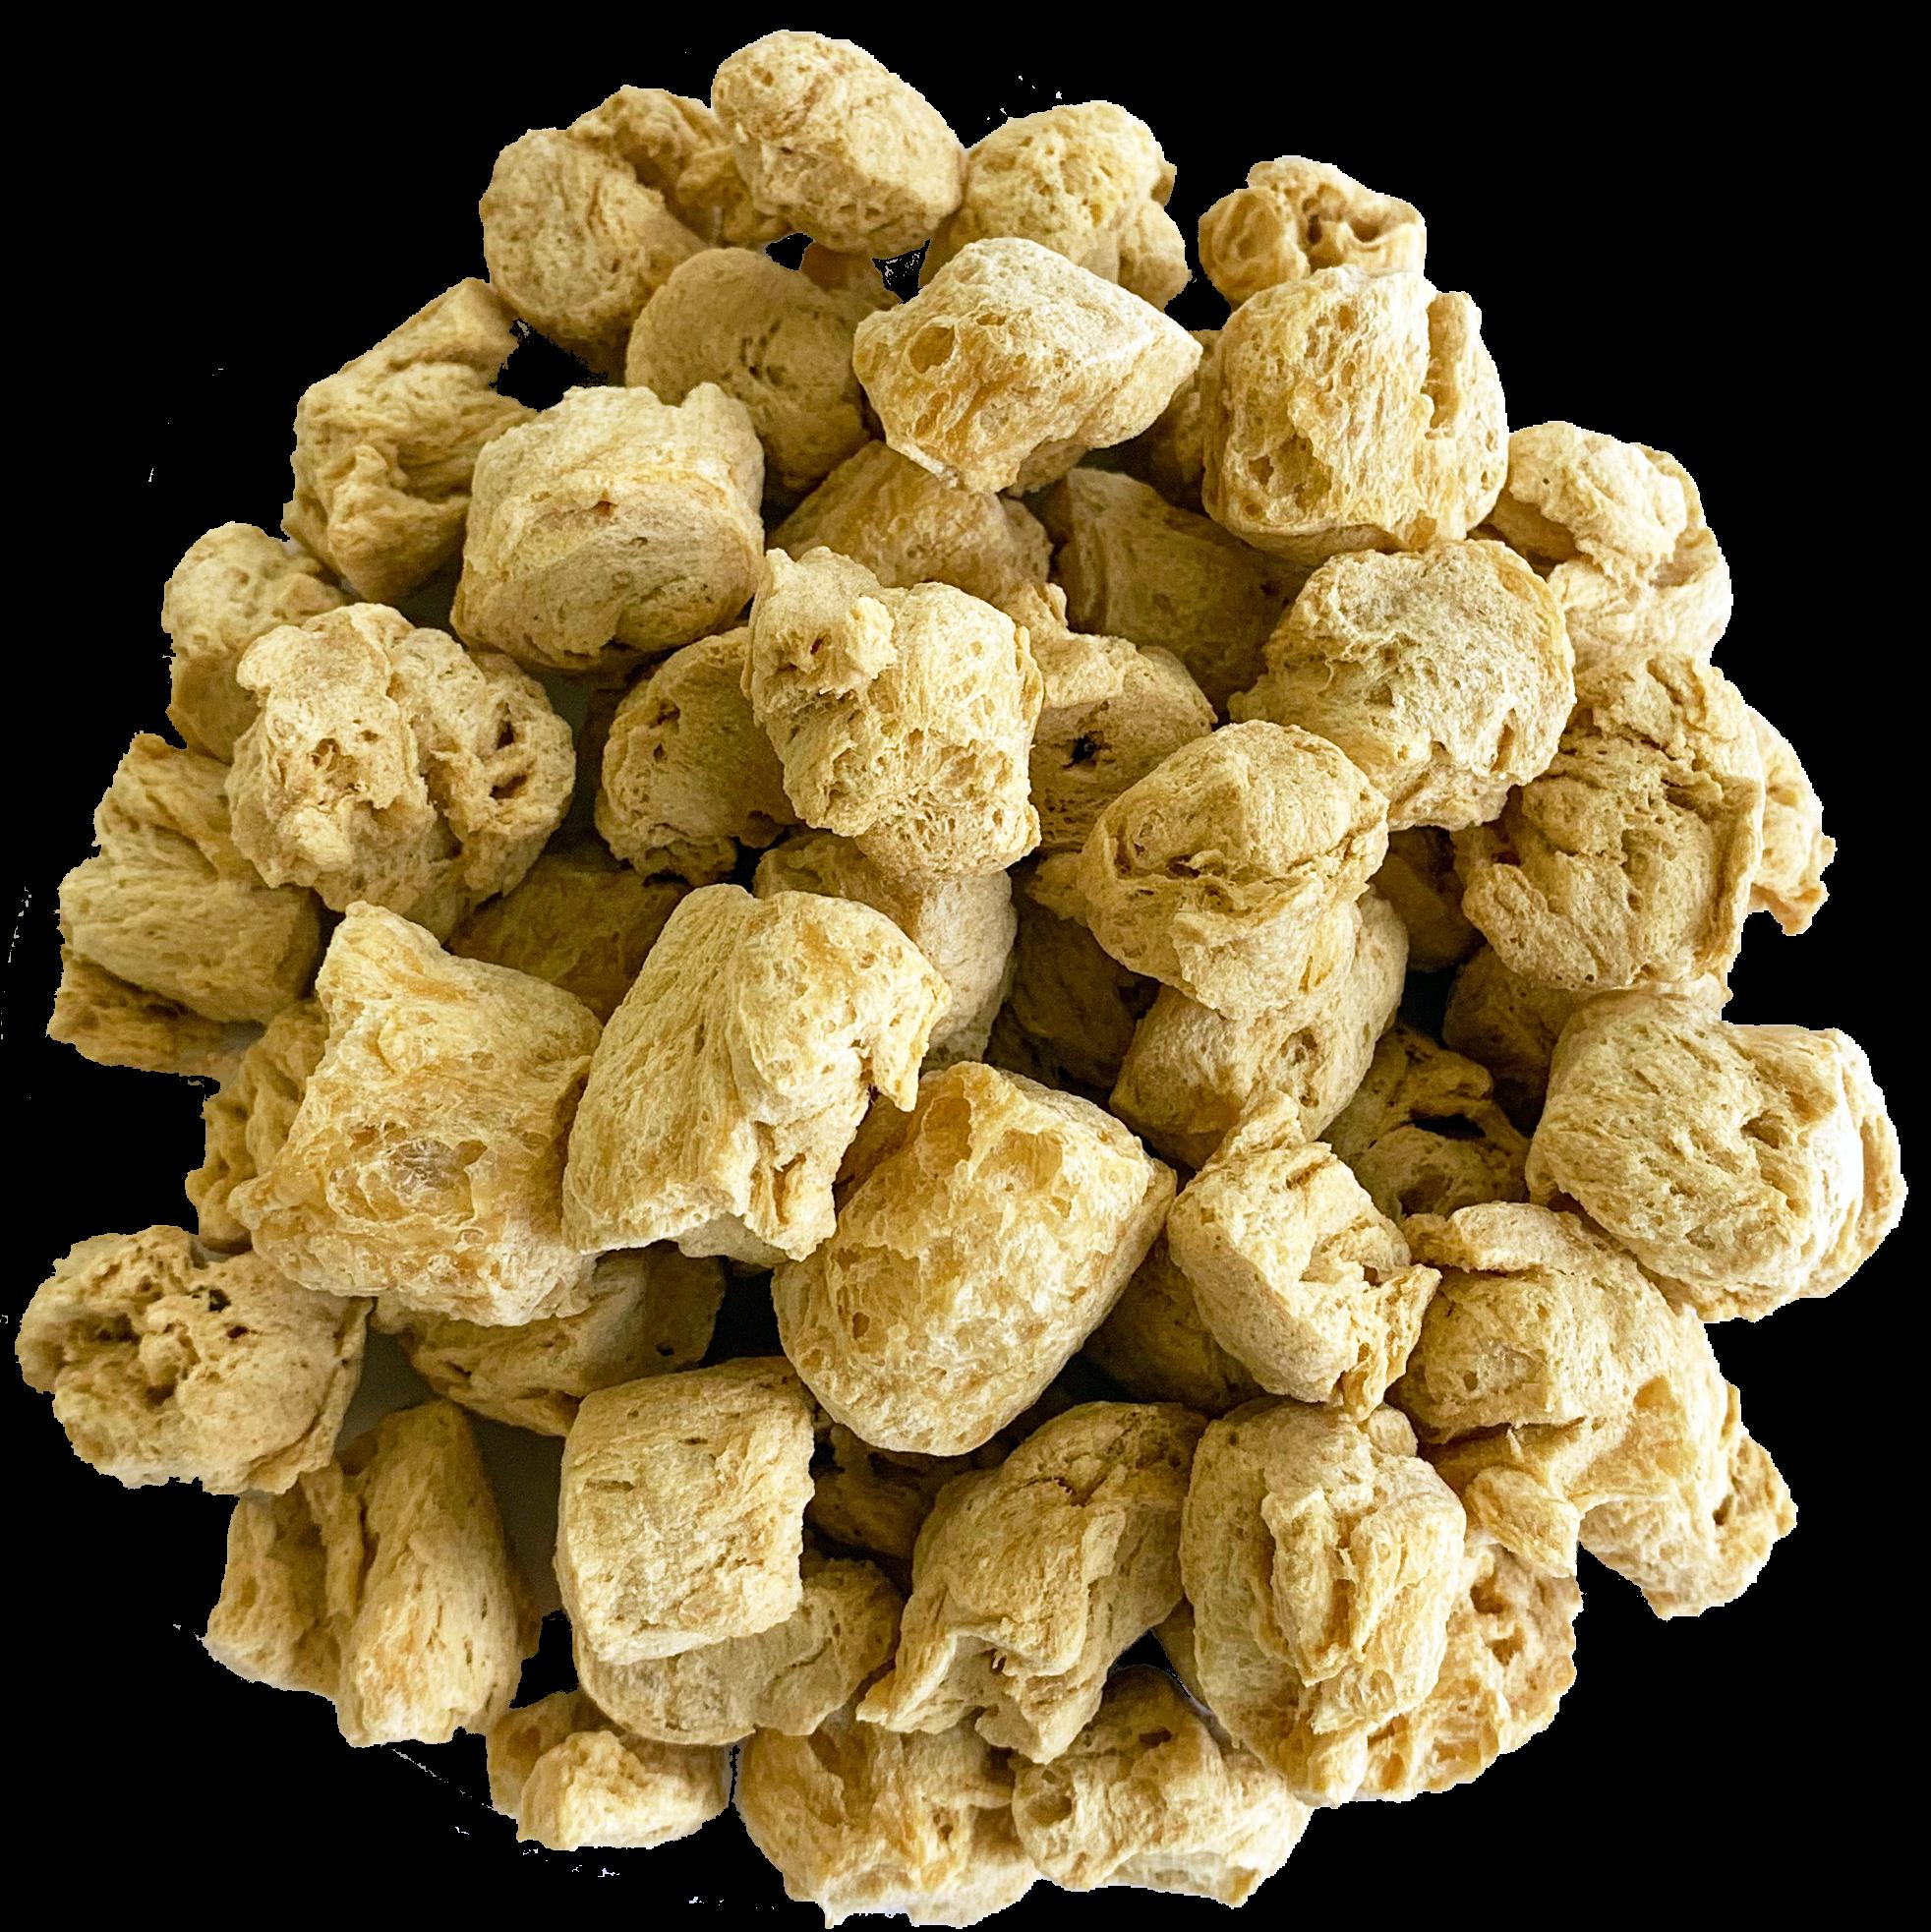 Vestkorn textured protein (TVP)